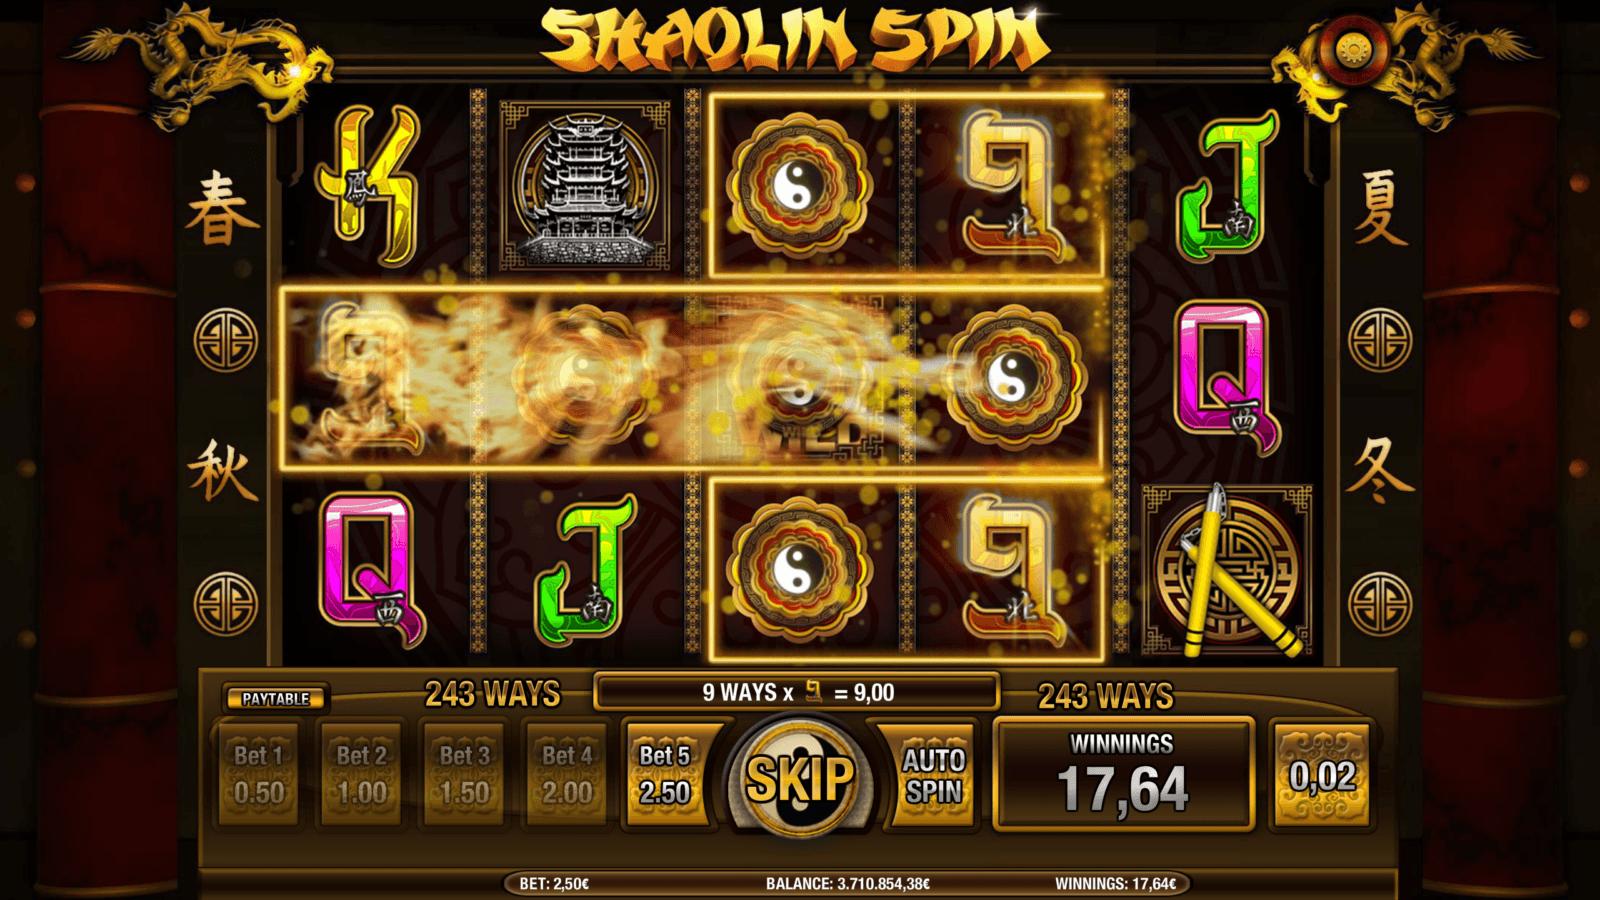 Shaolin Spin slots game